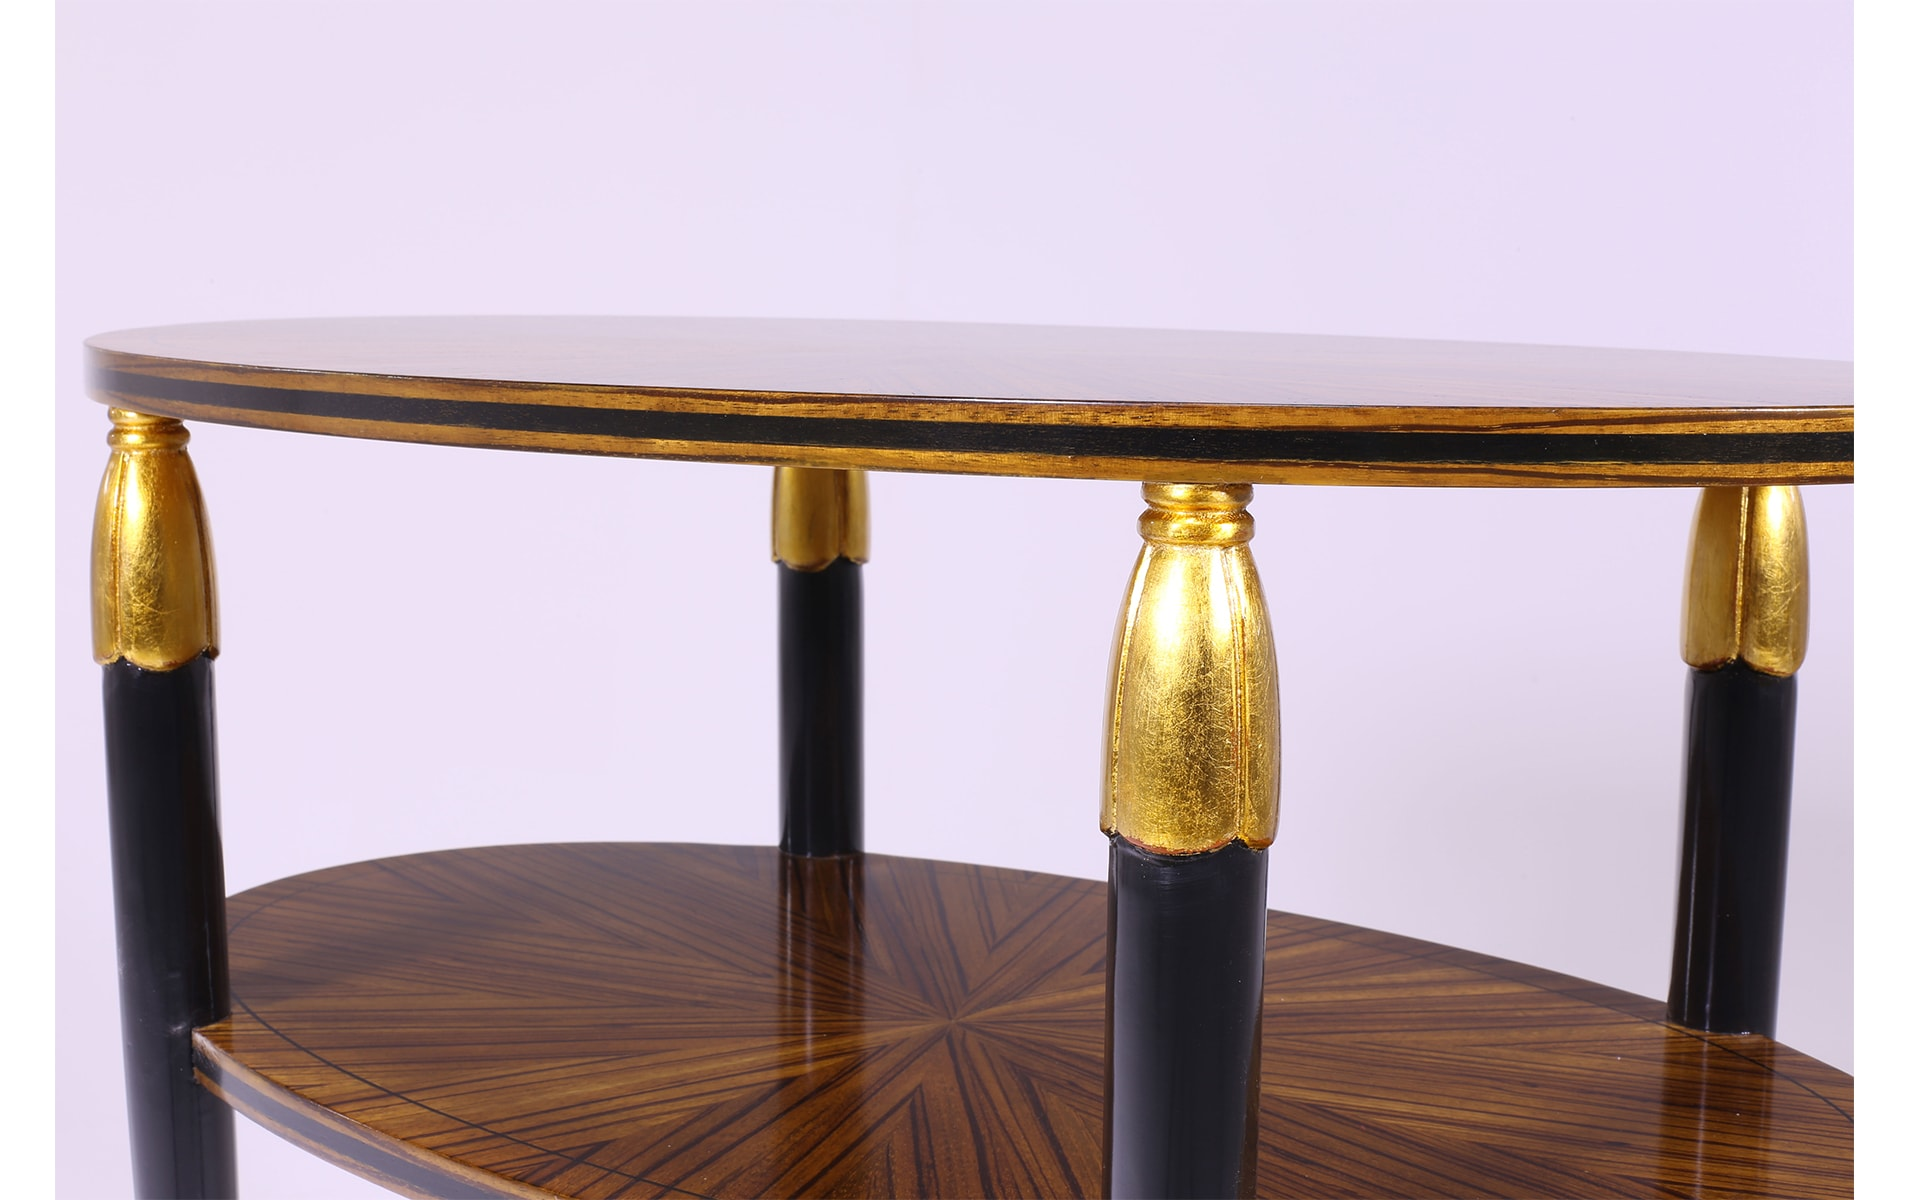 Oval Art Nouveau Style Tea Table